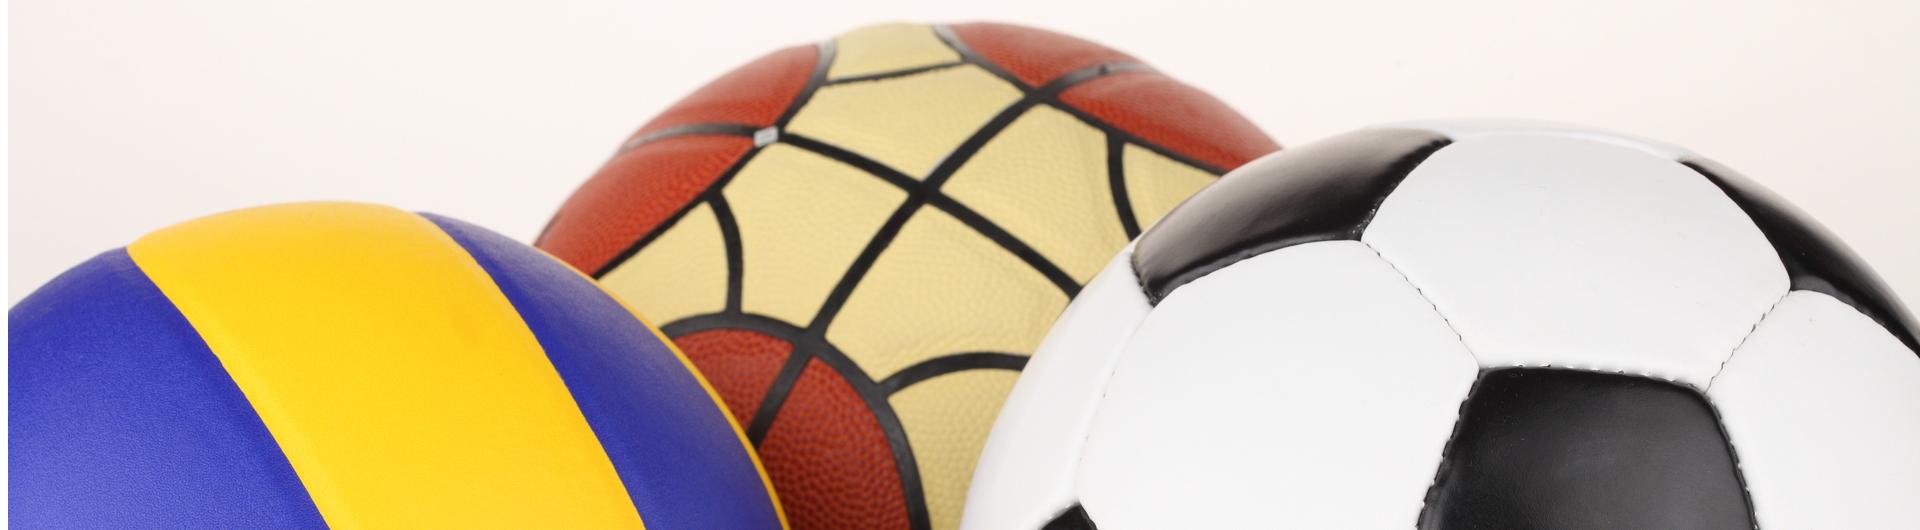 Equipements sportifs ot clichy - Piscine municipale clichy ...